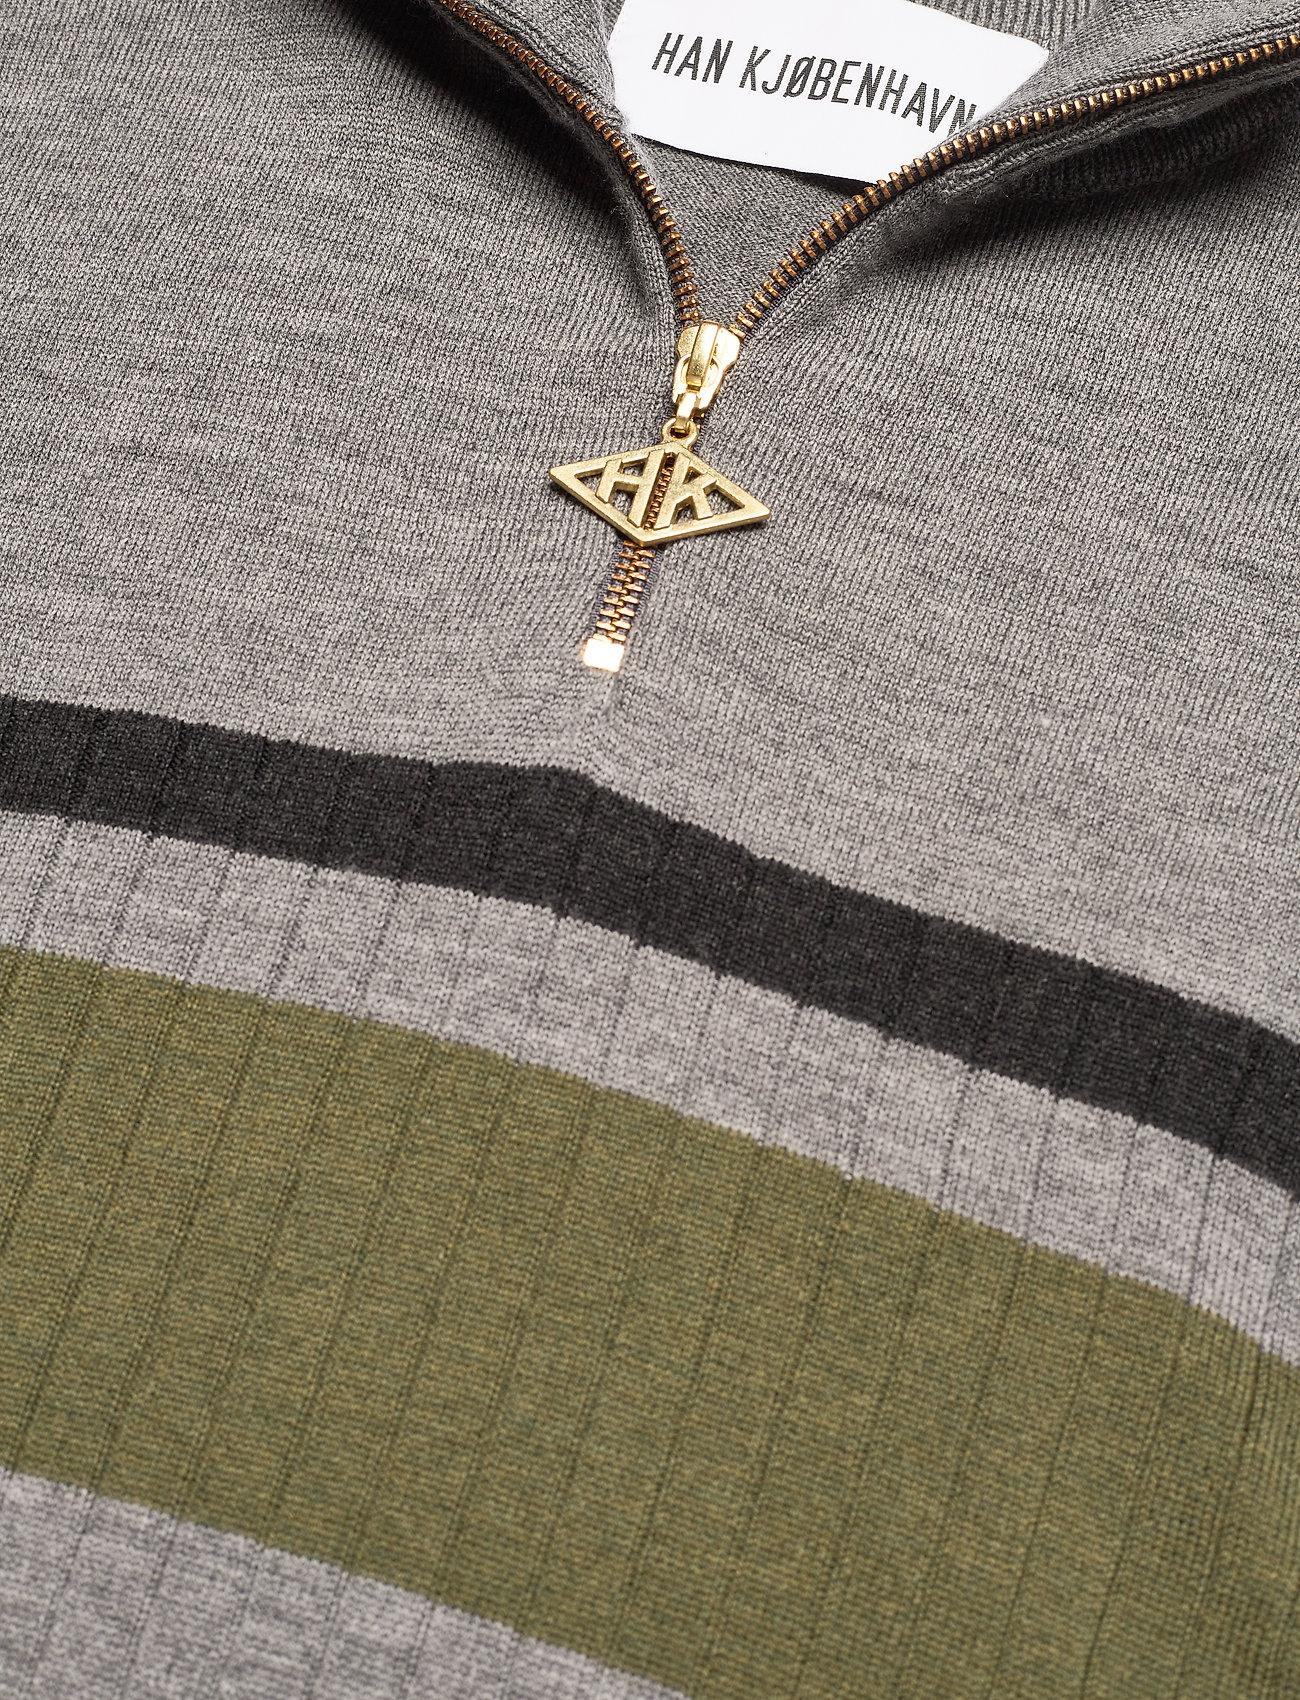 HAN Kjøbenhavn - Half Zip Long Sleeve - truien met halve rits - grey - 2